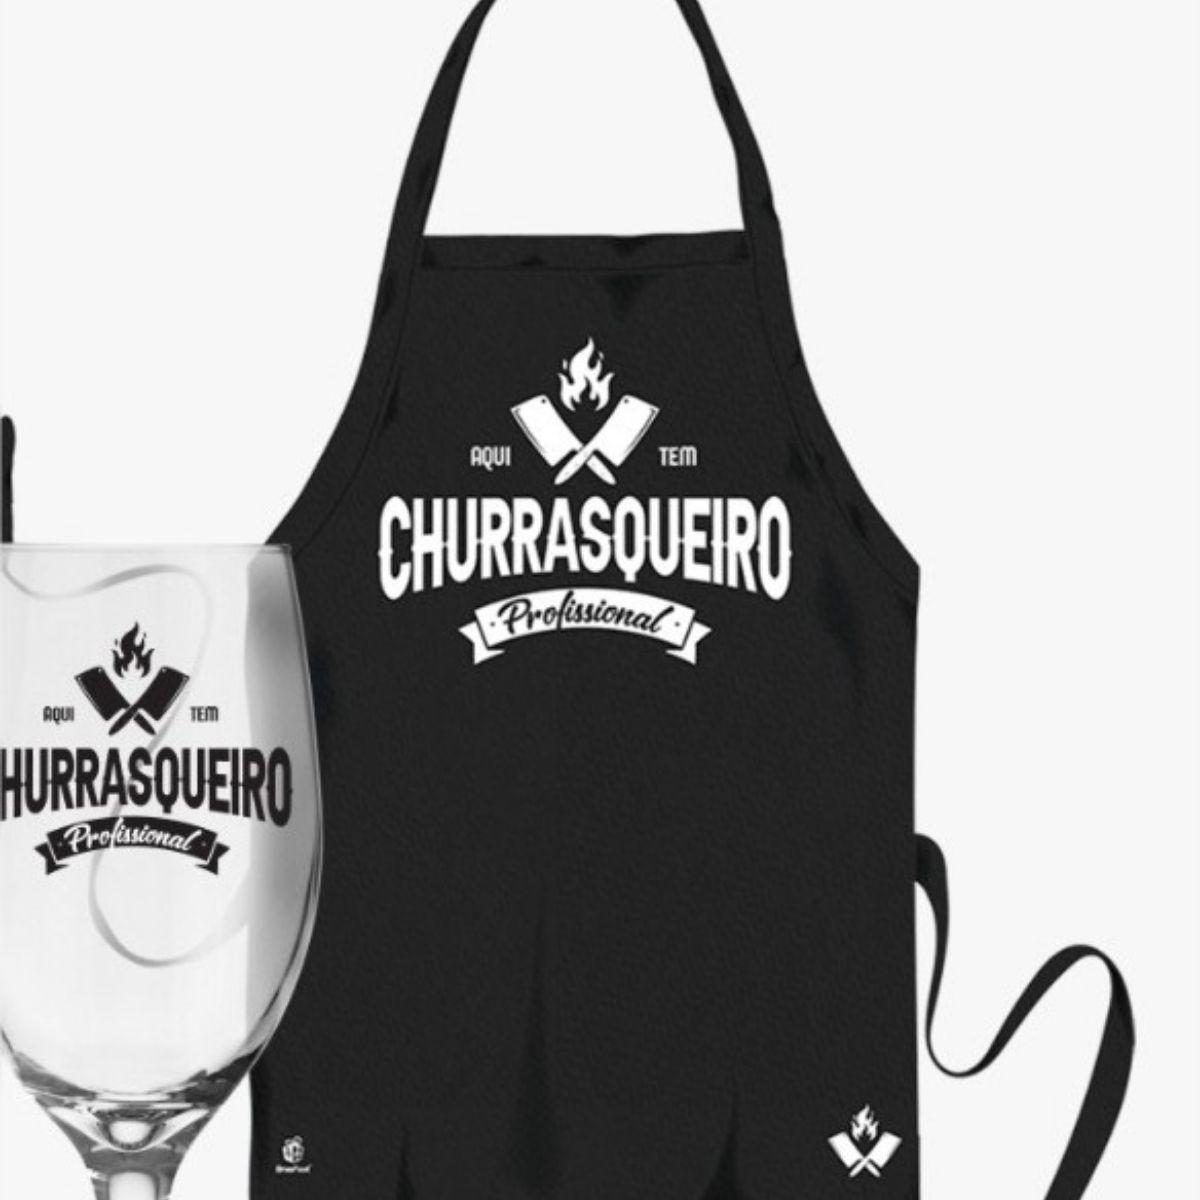 Kit Churrasqueiro Profissional Avental e Taça Presente Brasfoot